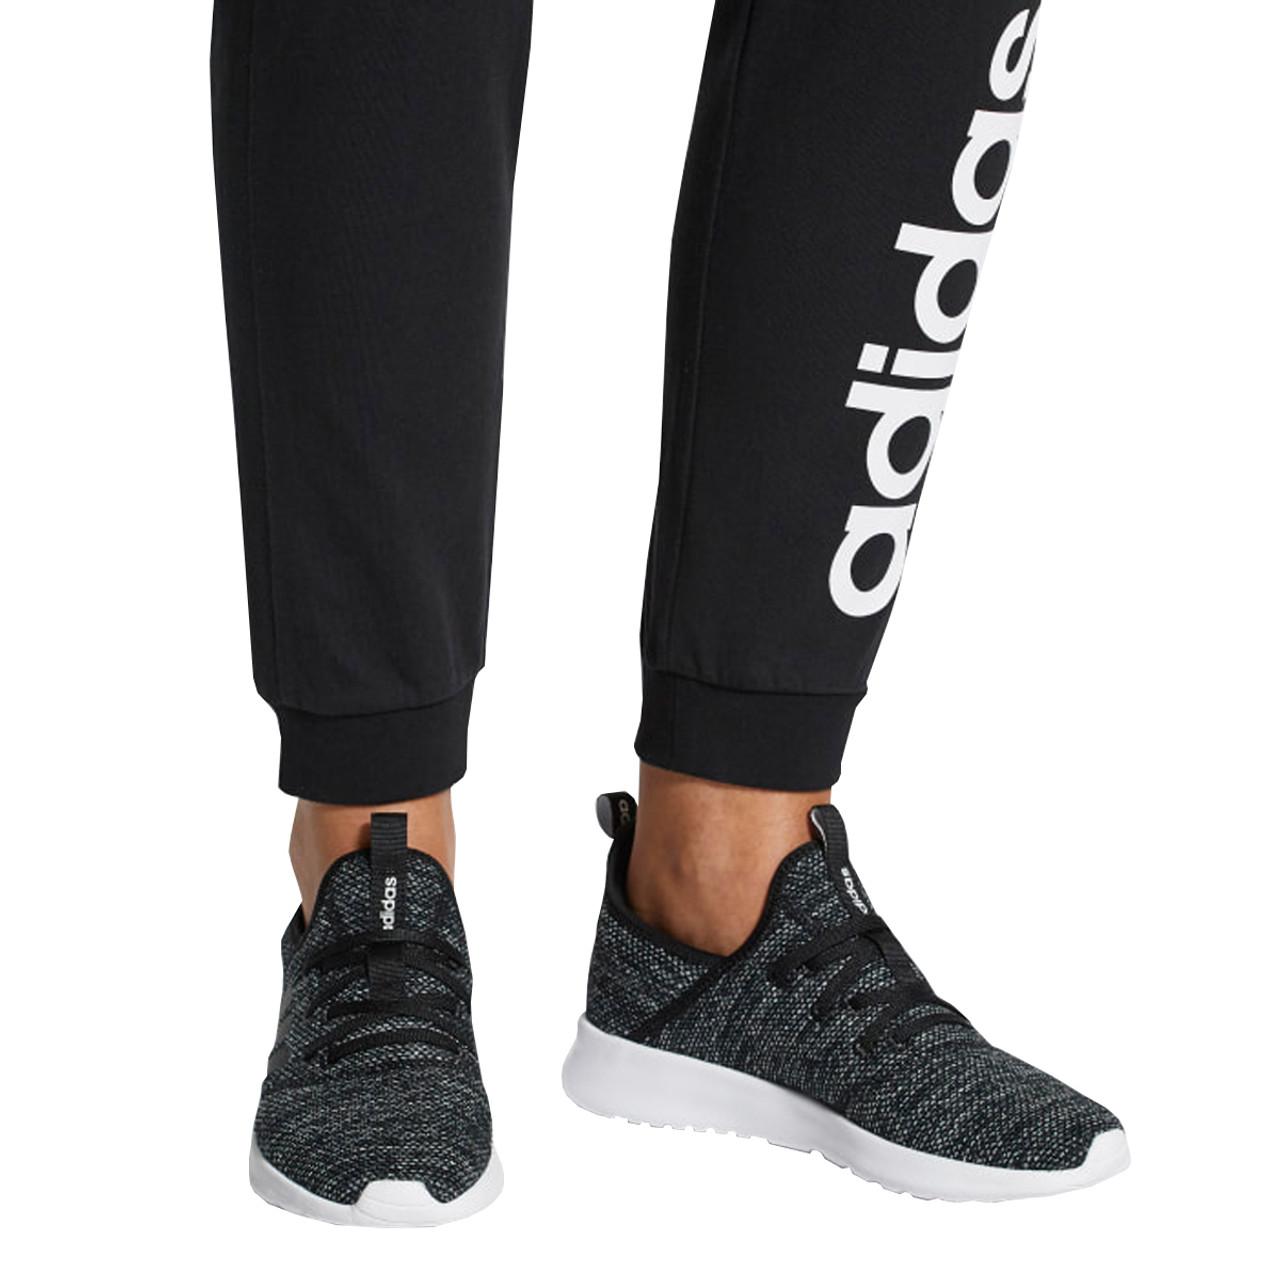 Adidas Cloudfoam Pure Women's Running Sneakers DB0694 - Black, White